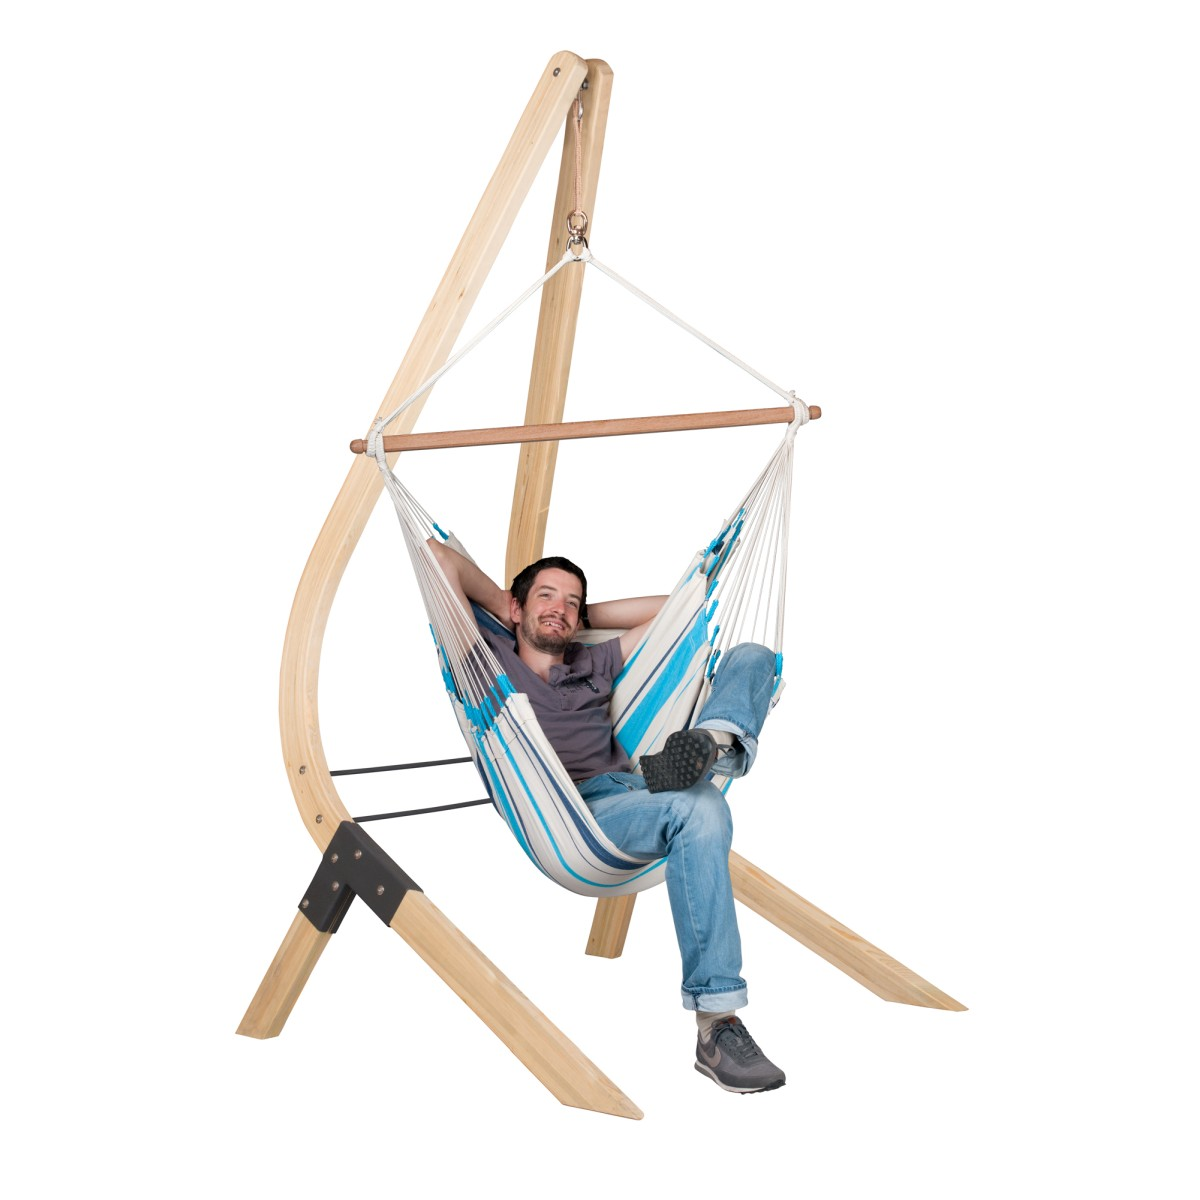 la siesta chaise hamac basic caribe a aqua blue support en bois. Black Bedroom Furniture Sets. Home Design Ideas